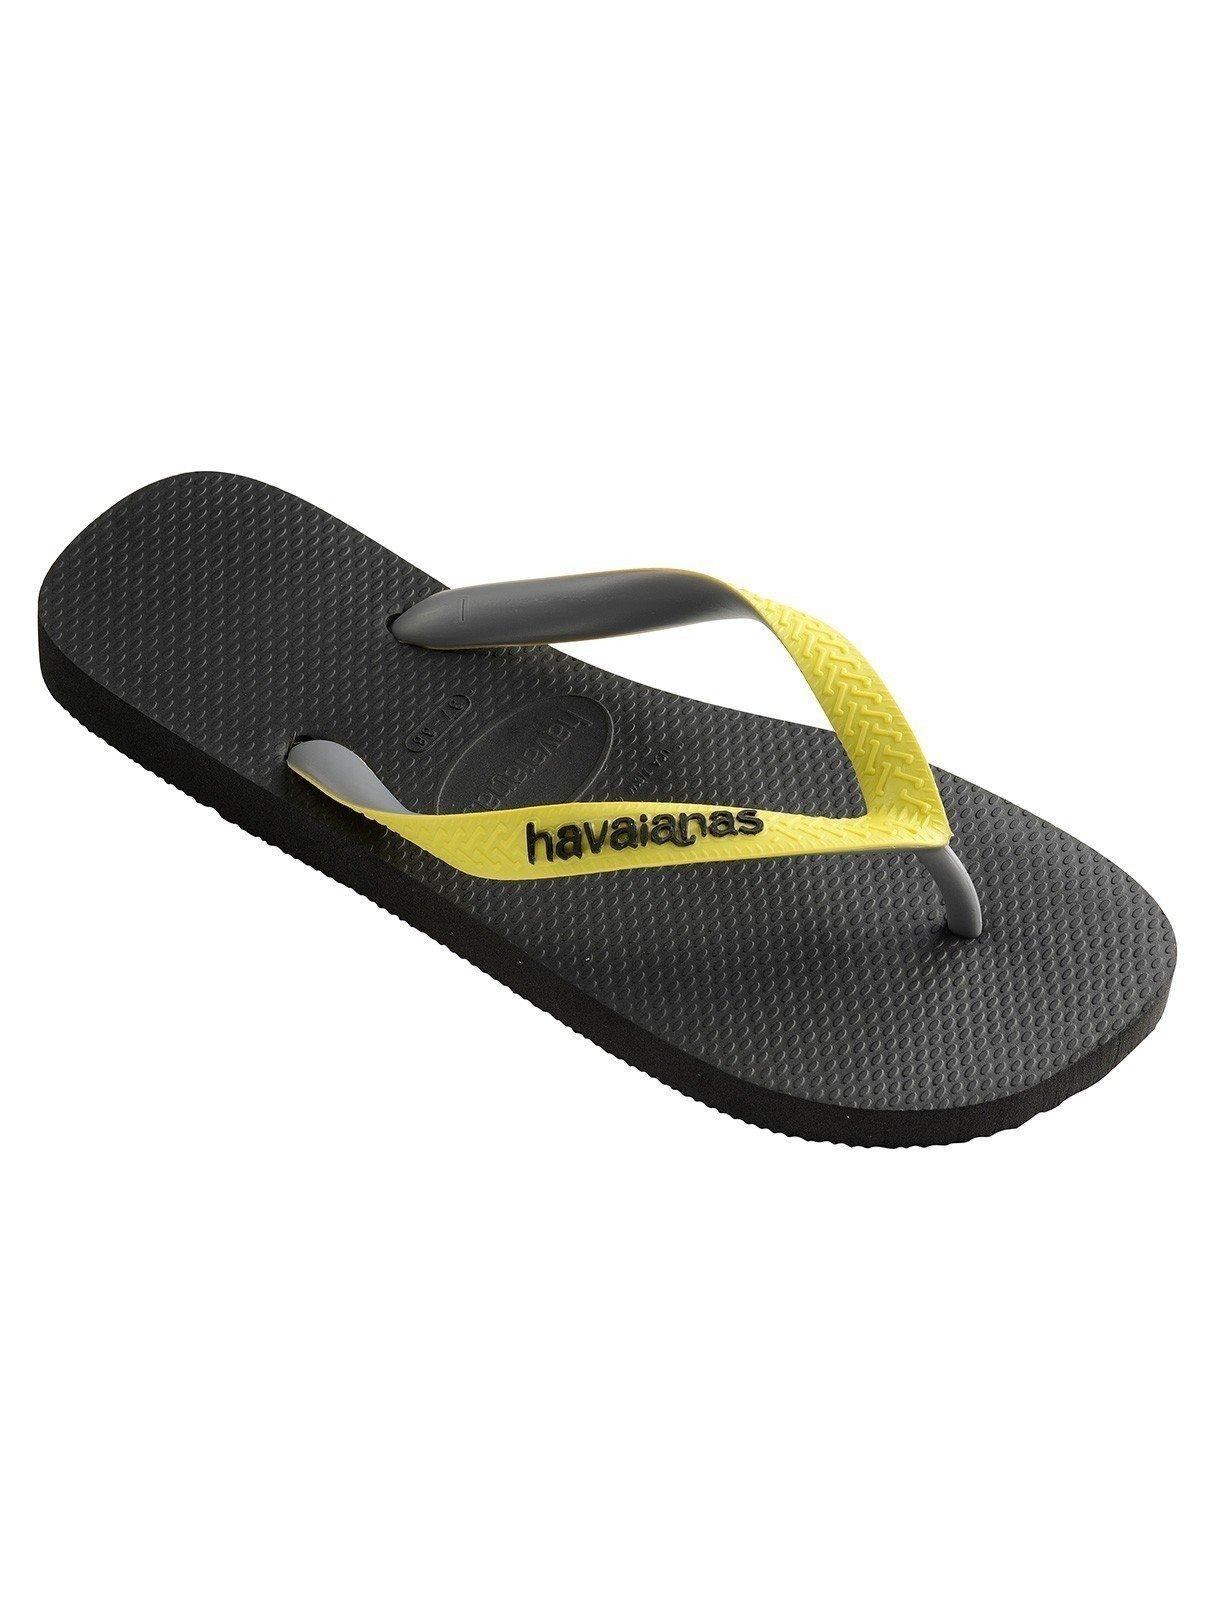 Havaianas Unisex Top Mix Rubber Flip-Flops Black-Neon Yellow Size EU 47/48 - Bra 45/46 - US M12